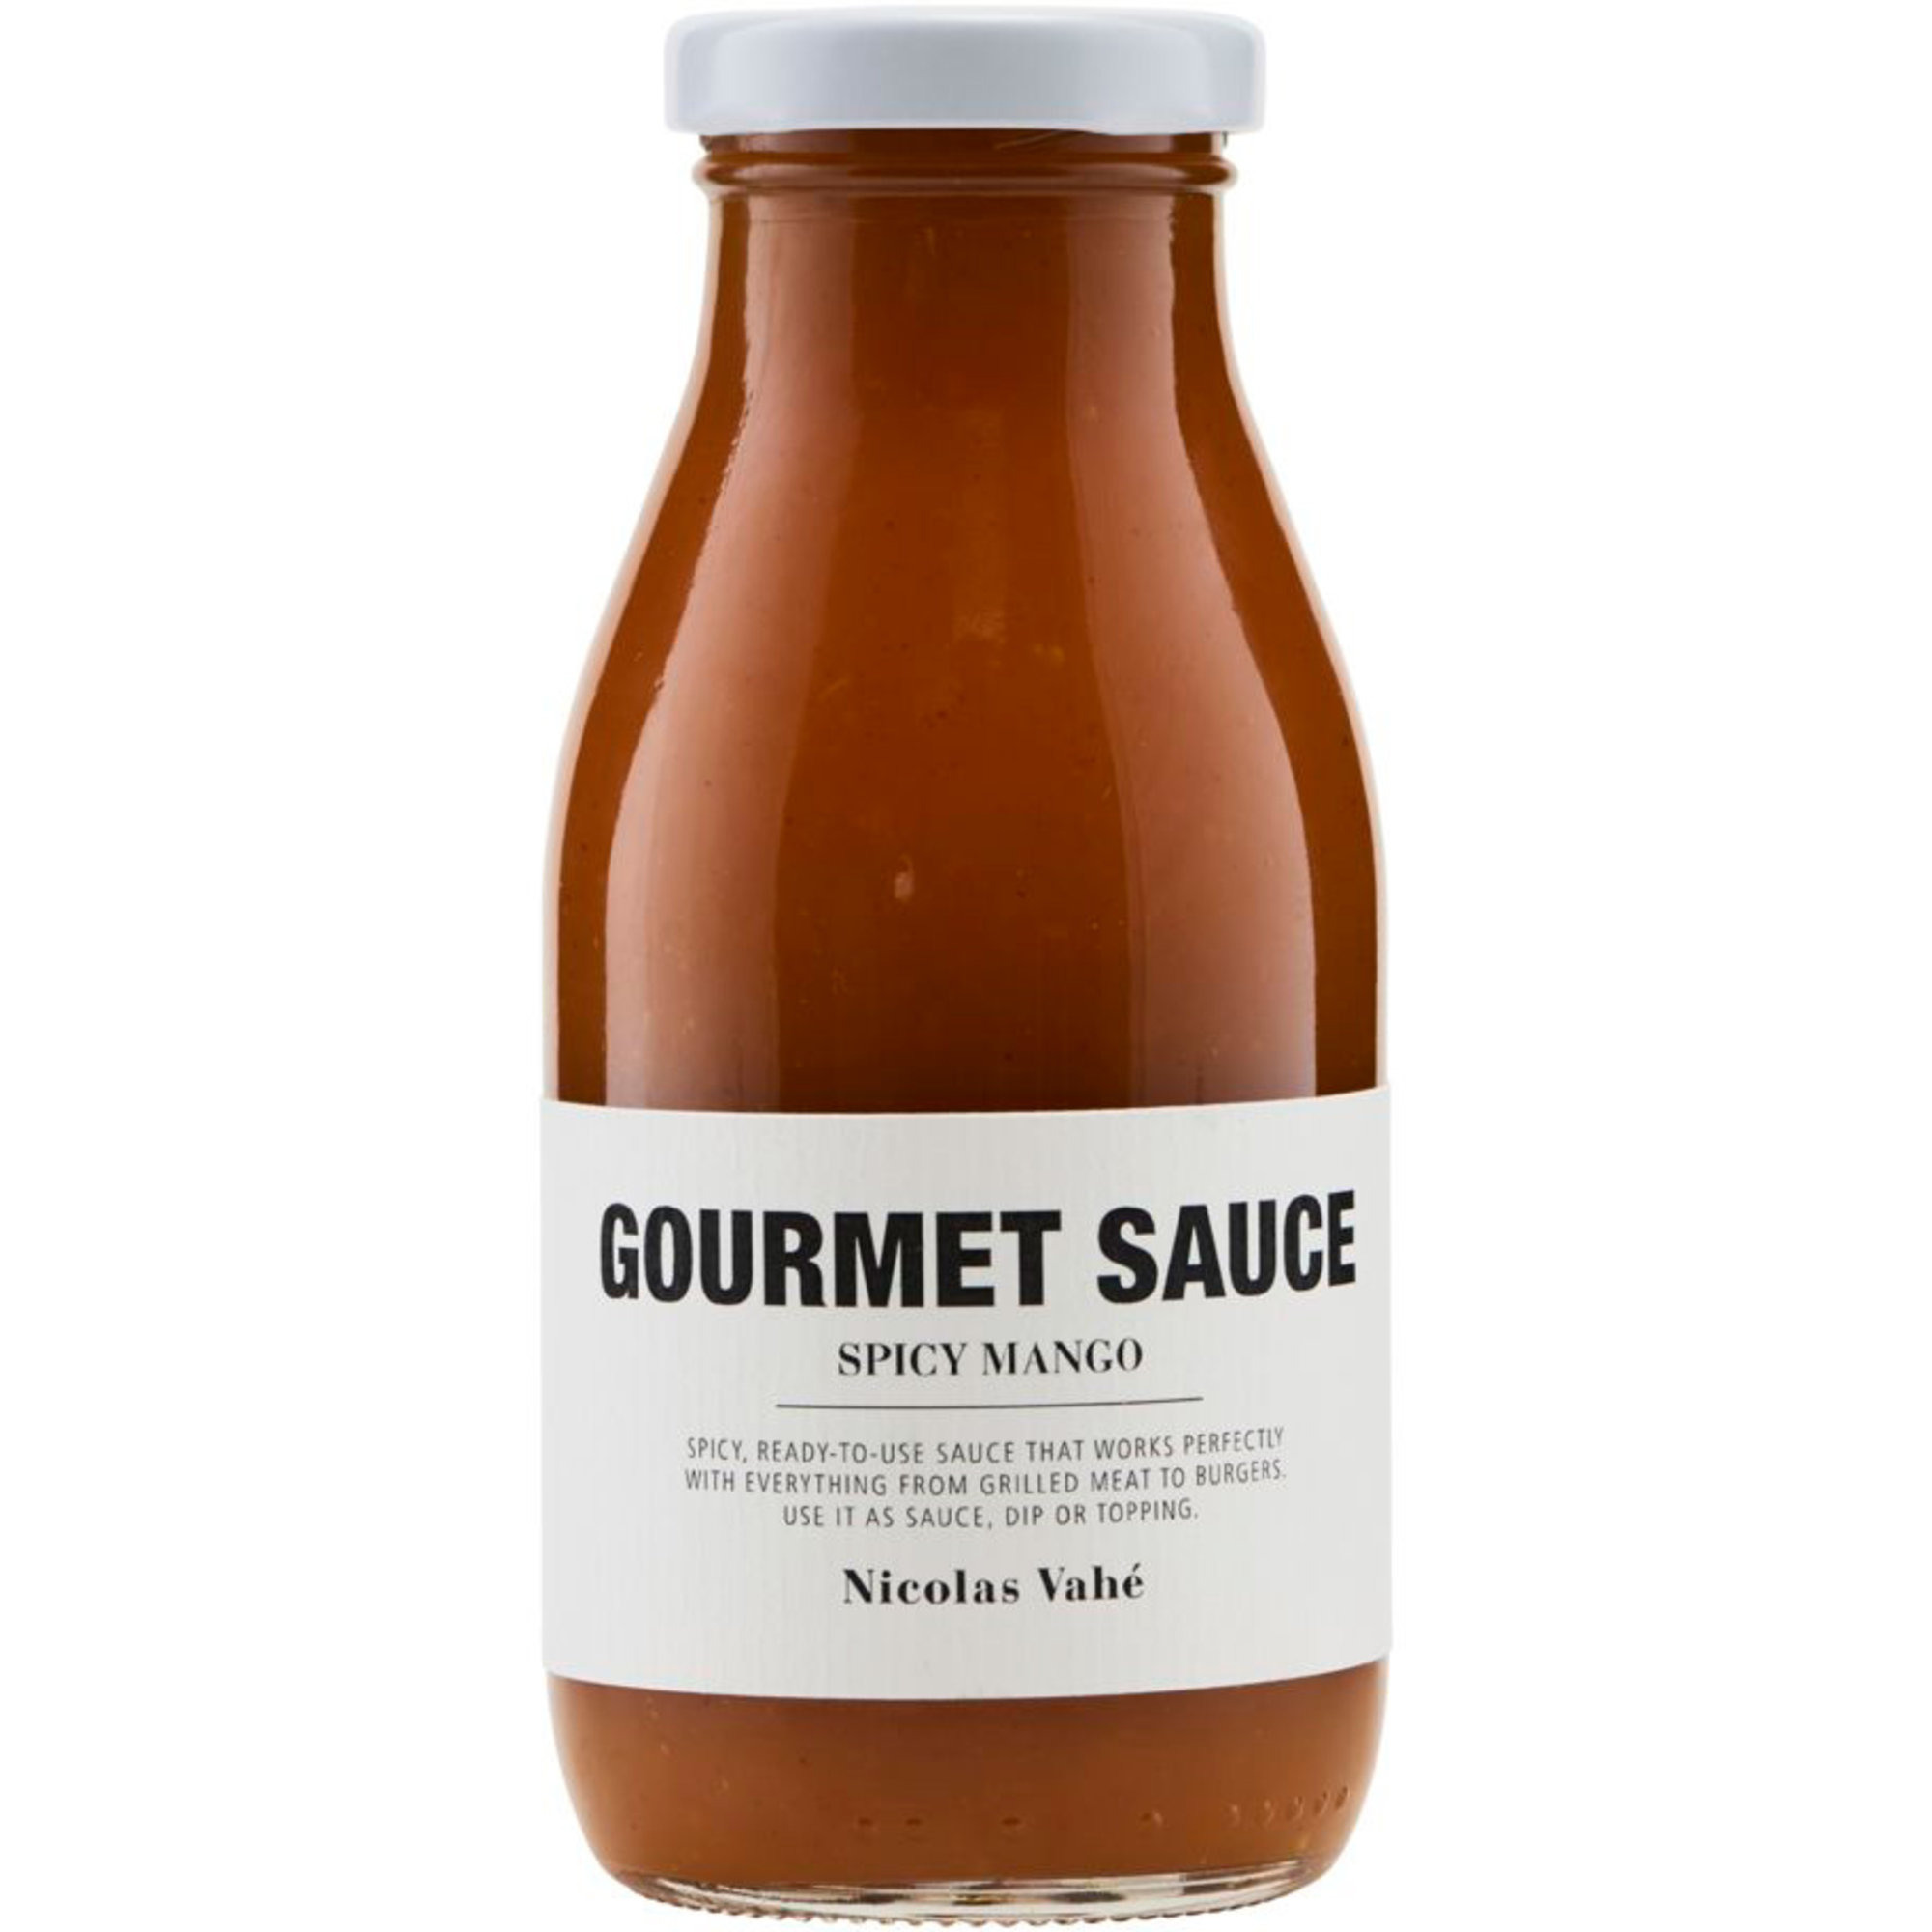 Nicolas Vahé Spicy Mango gourmet sauce